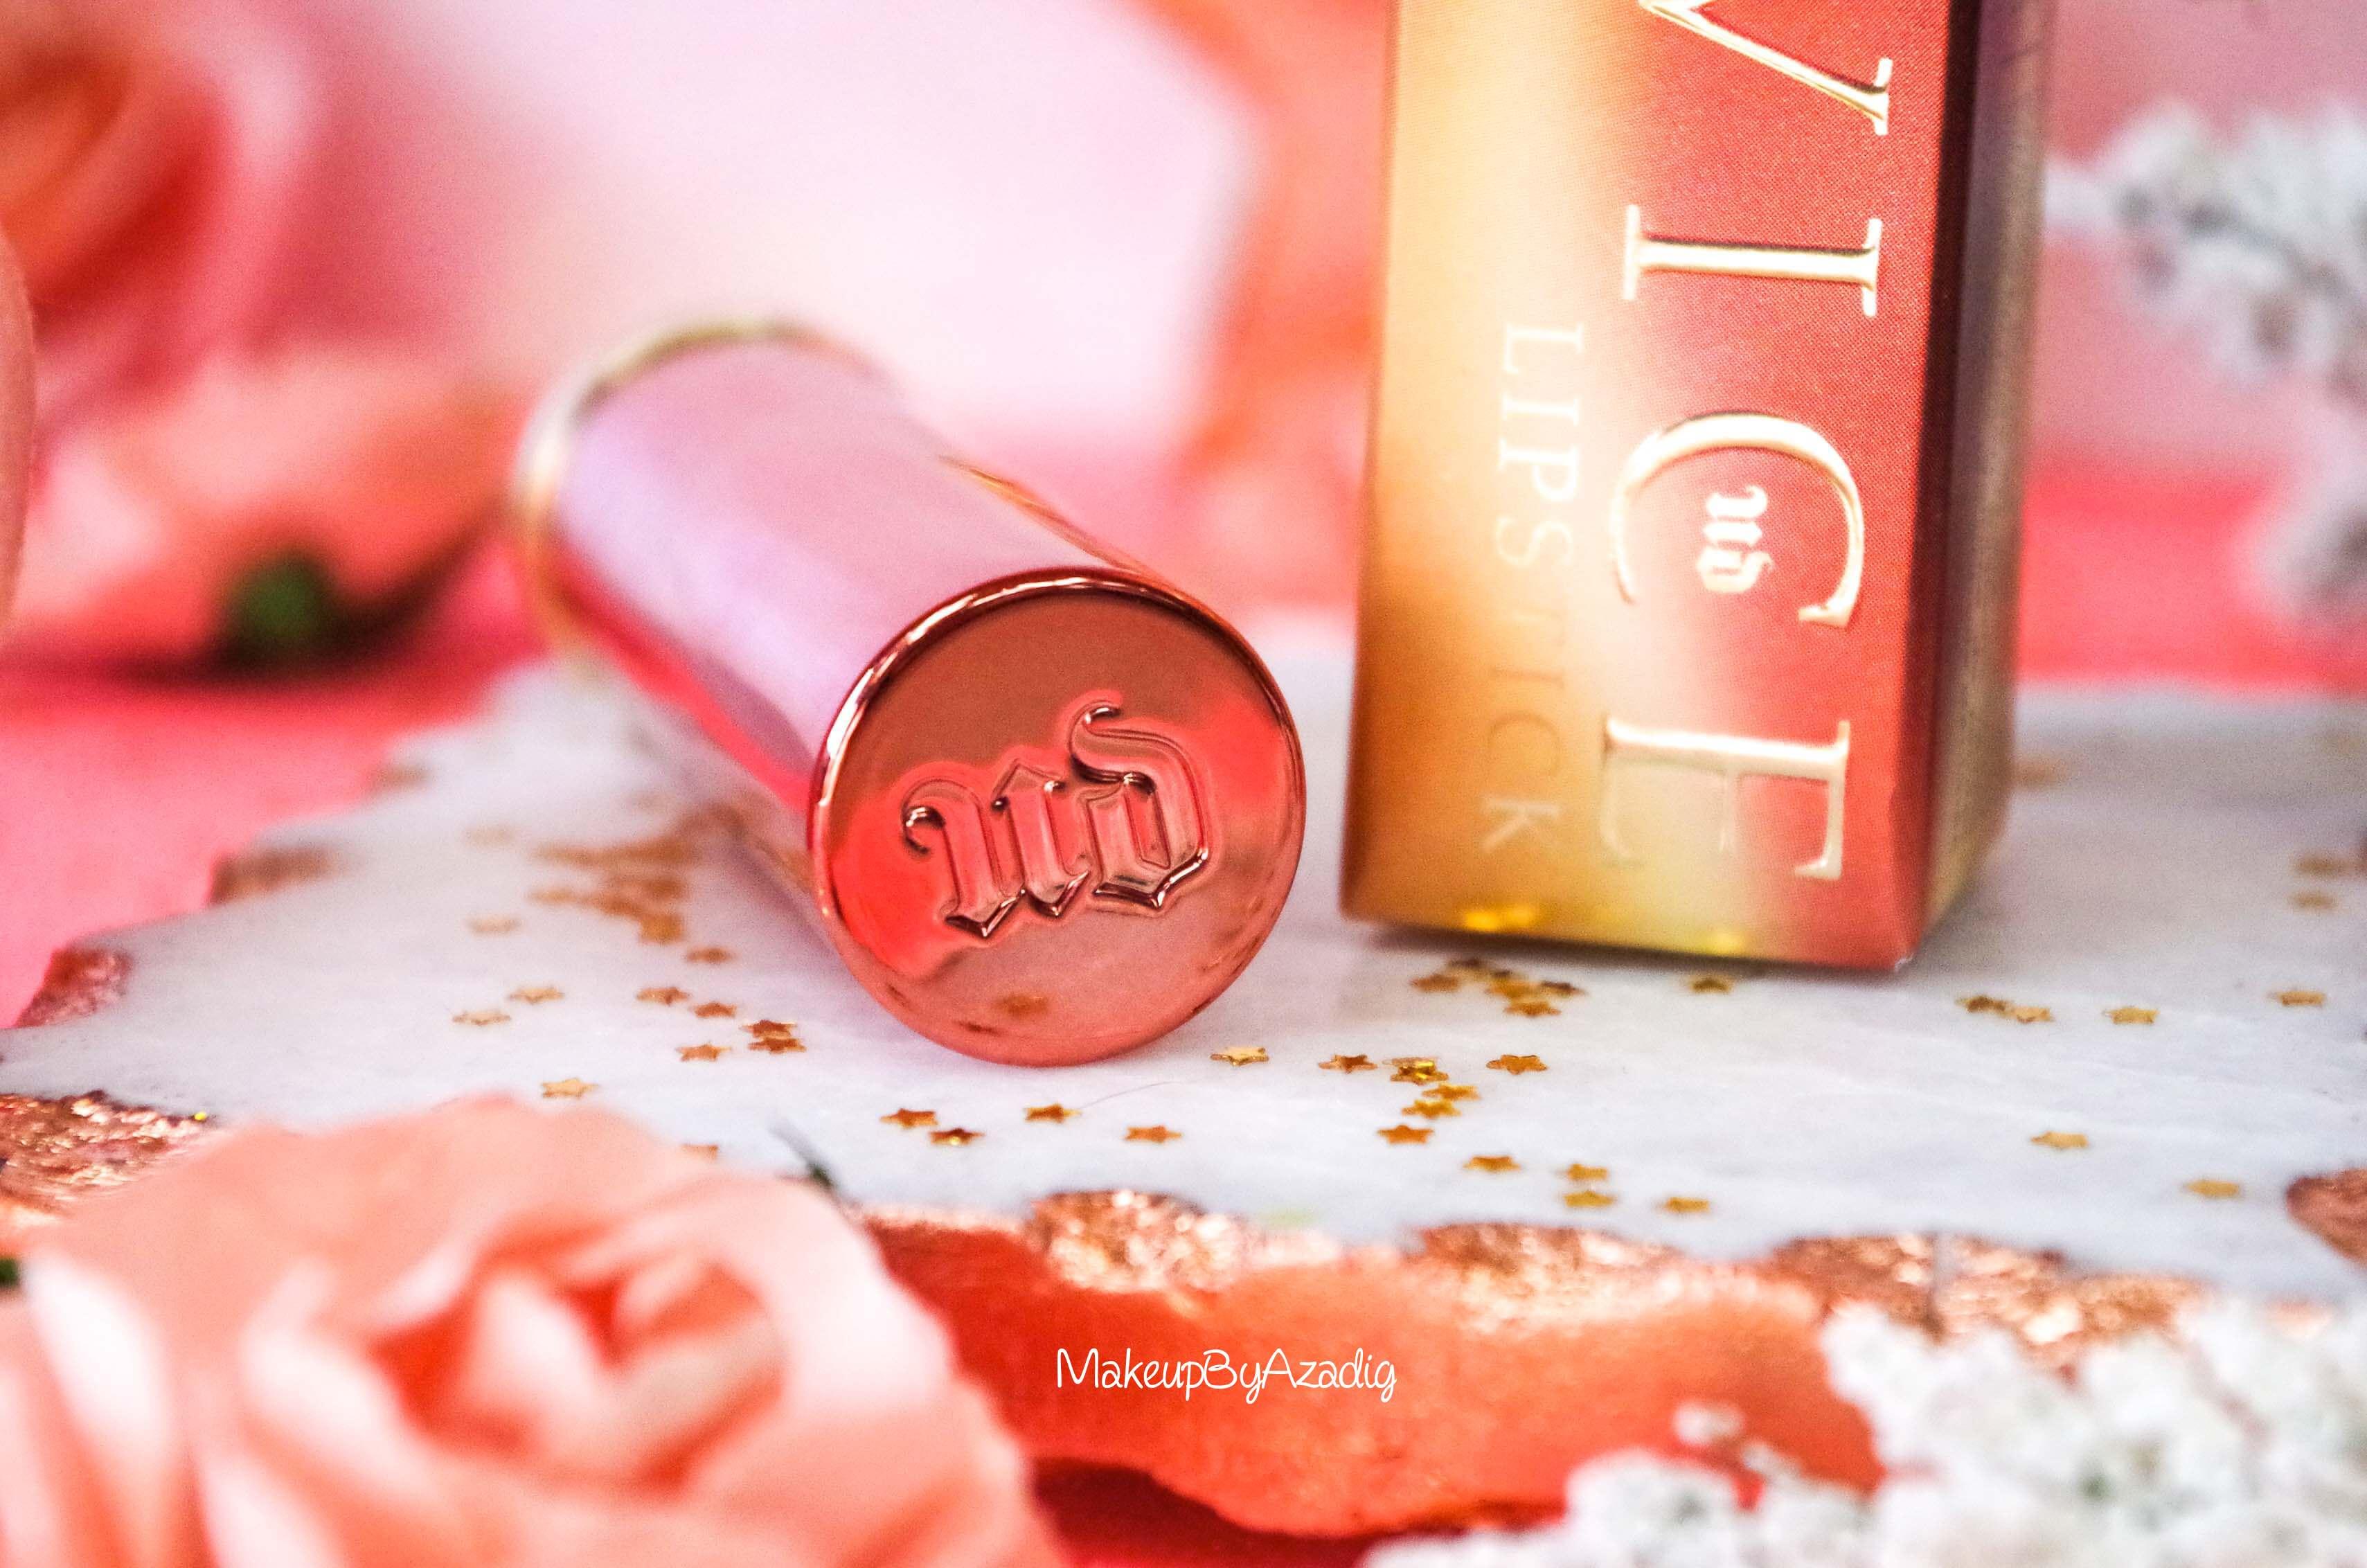 logo-revue-review-naked-heat-vice-lipstick-fuel-heat-scorched-sephora-urban-decay-makeupbyazadig-prix-avis-troyes